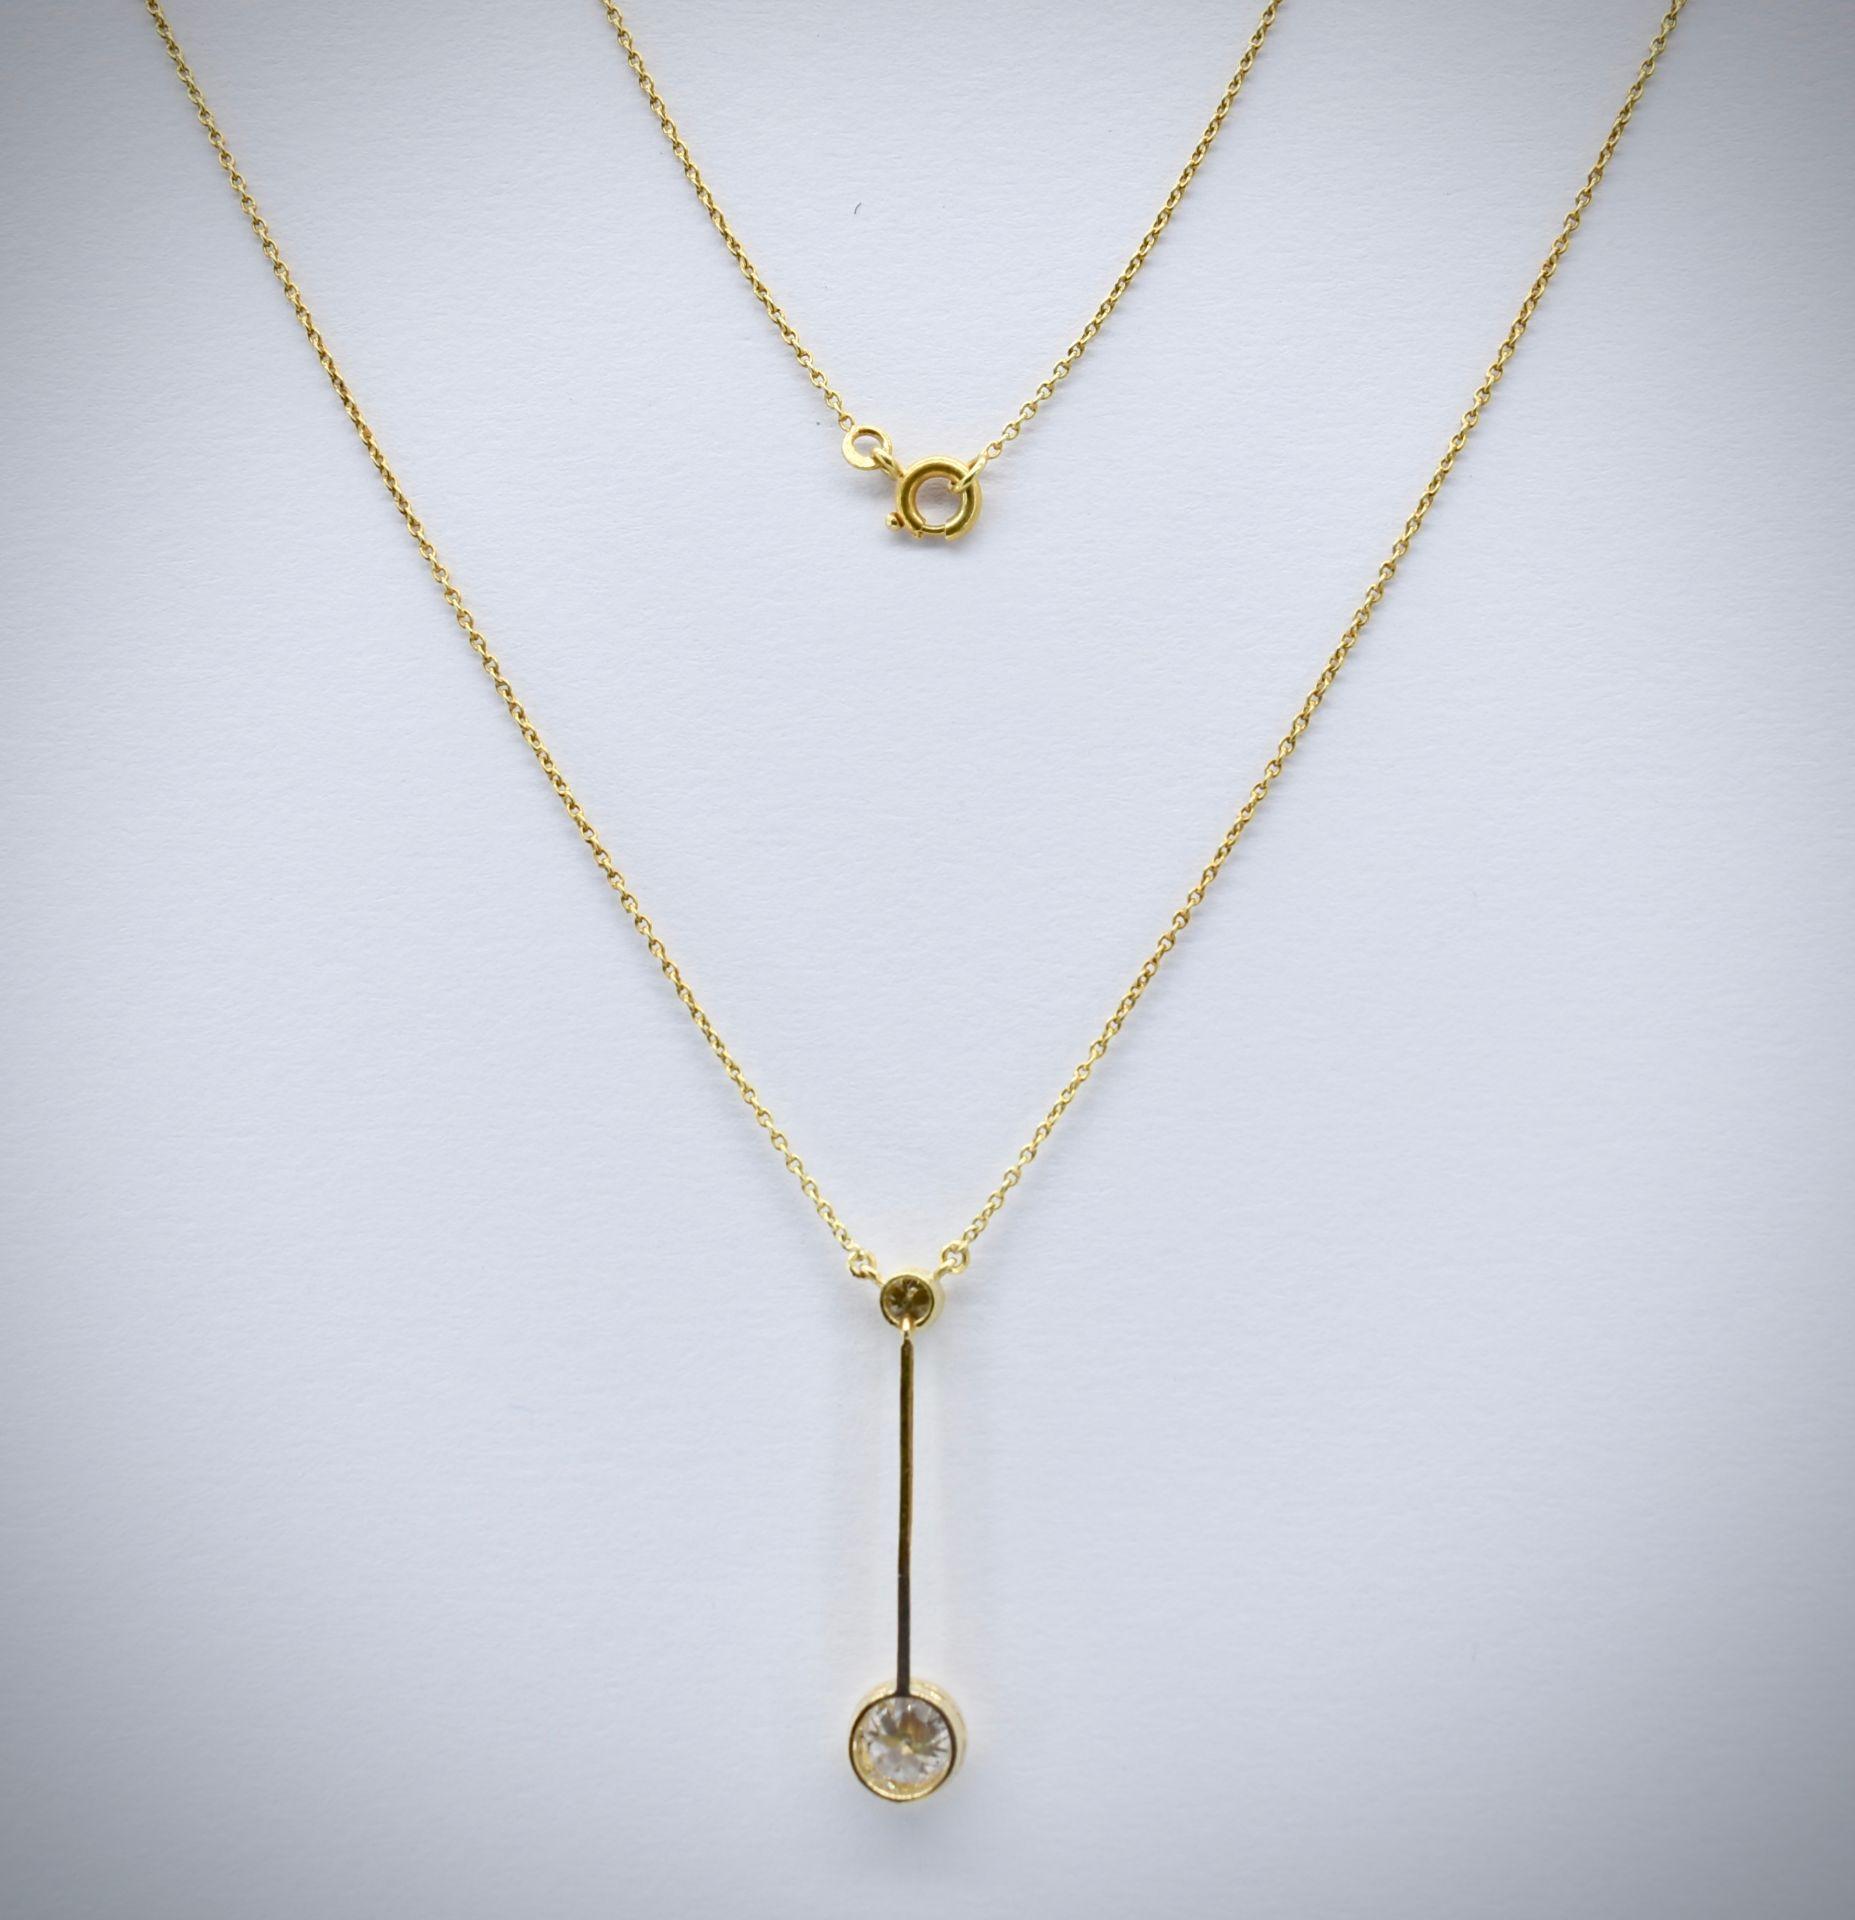 14ct Gold & Diamond Pendant Necklace - Image 3 of 5